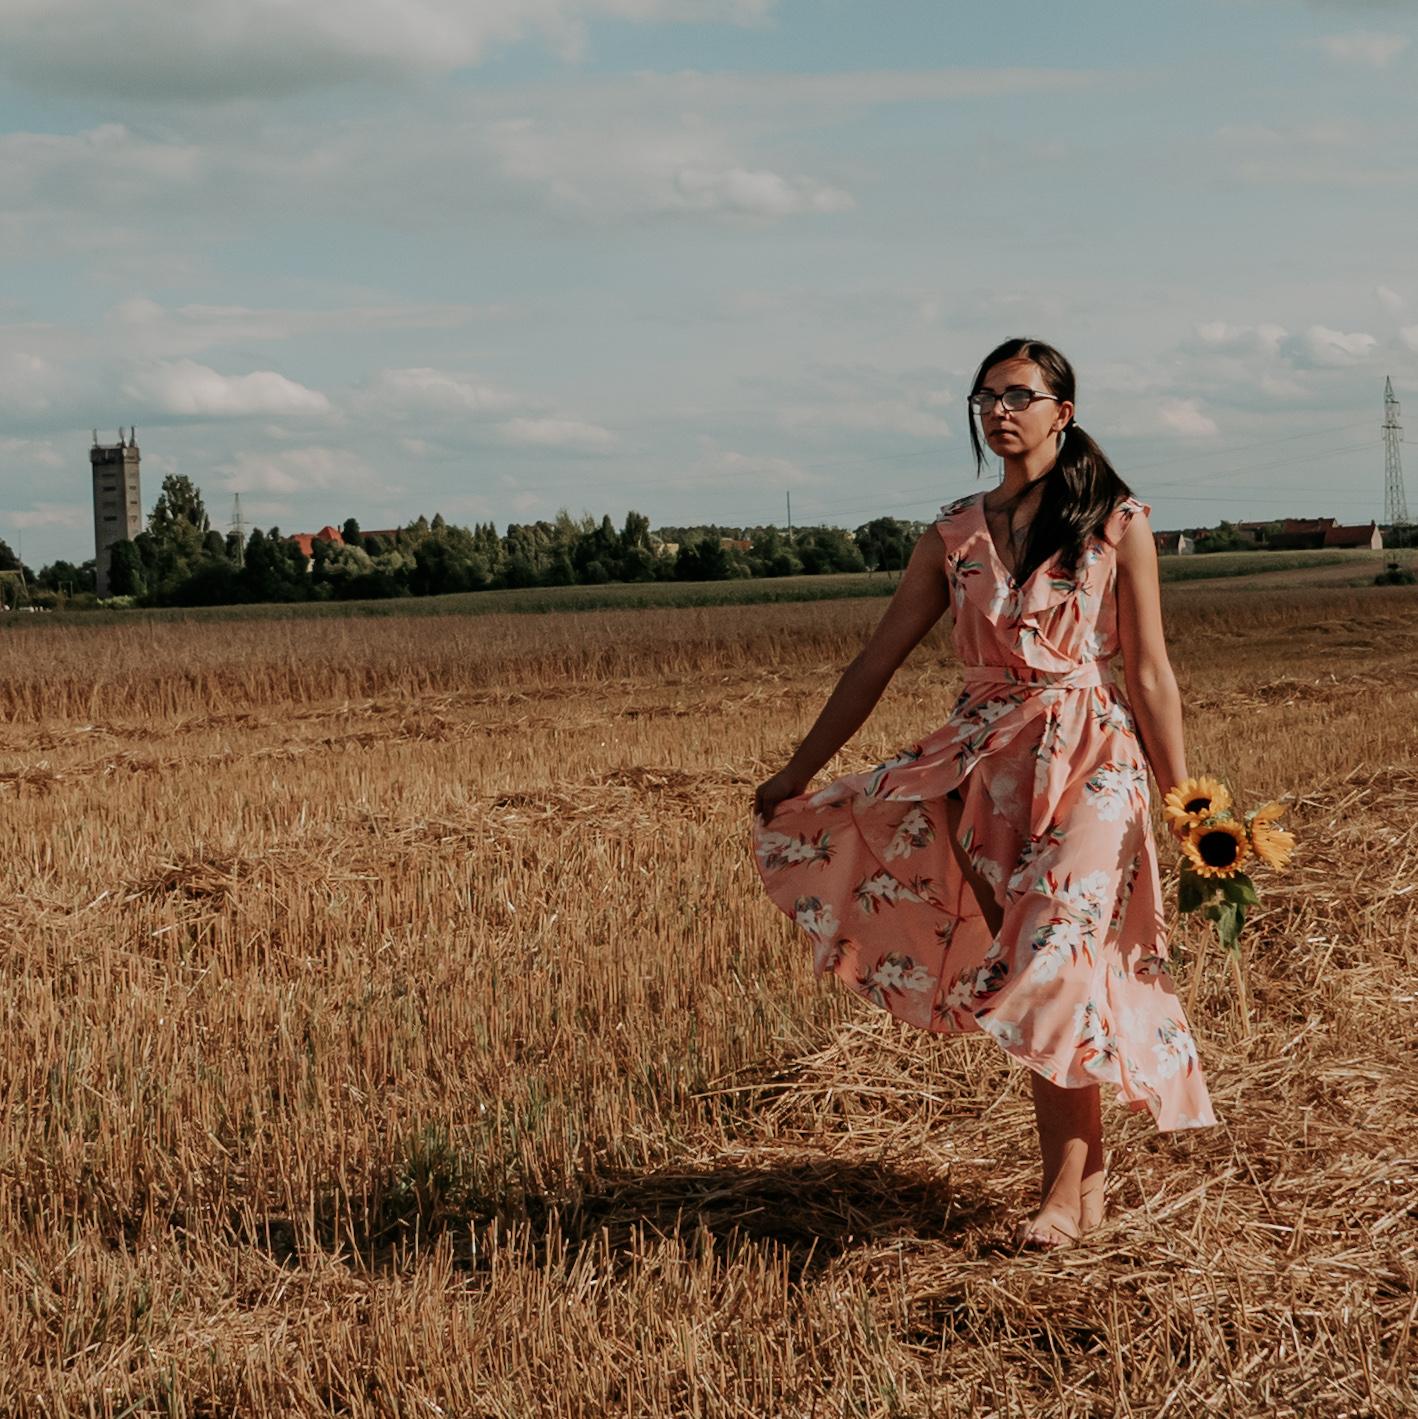 Sukienka na studniówkę 2022